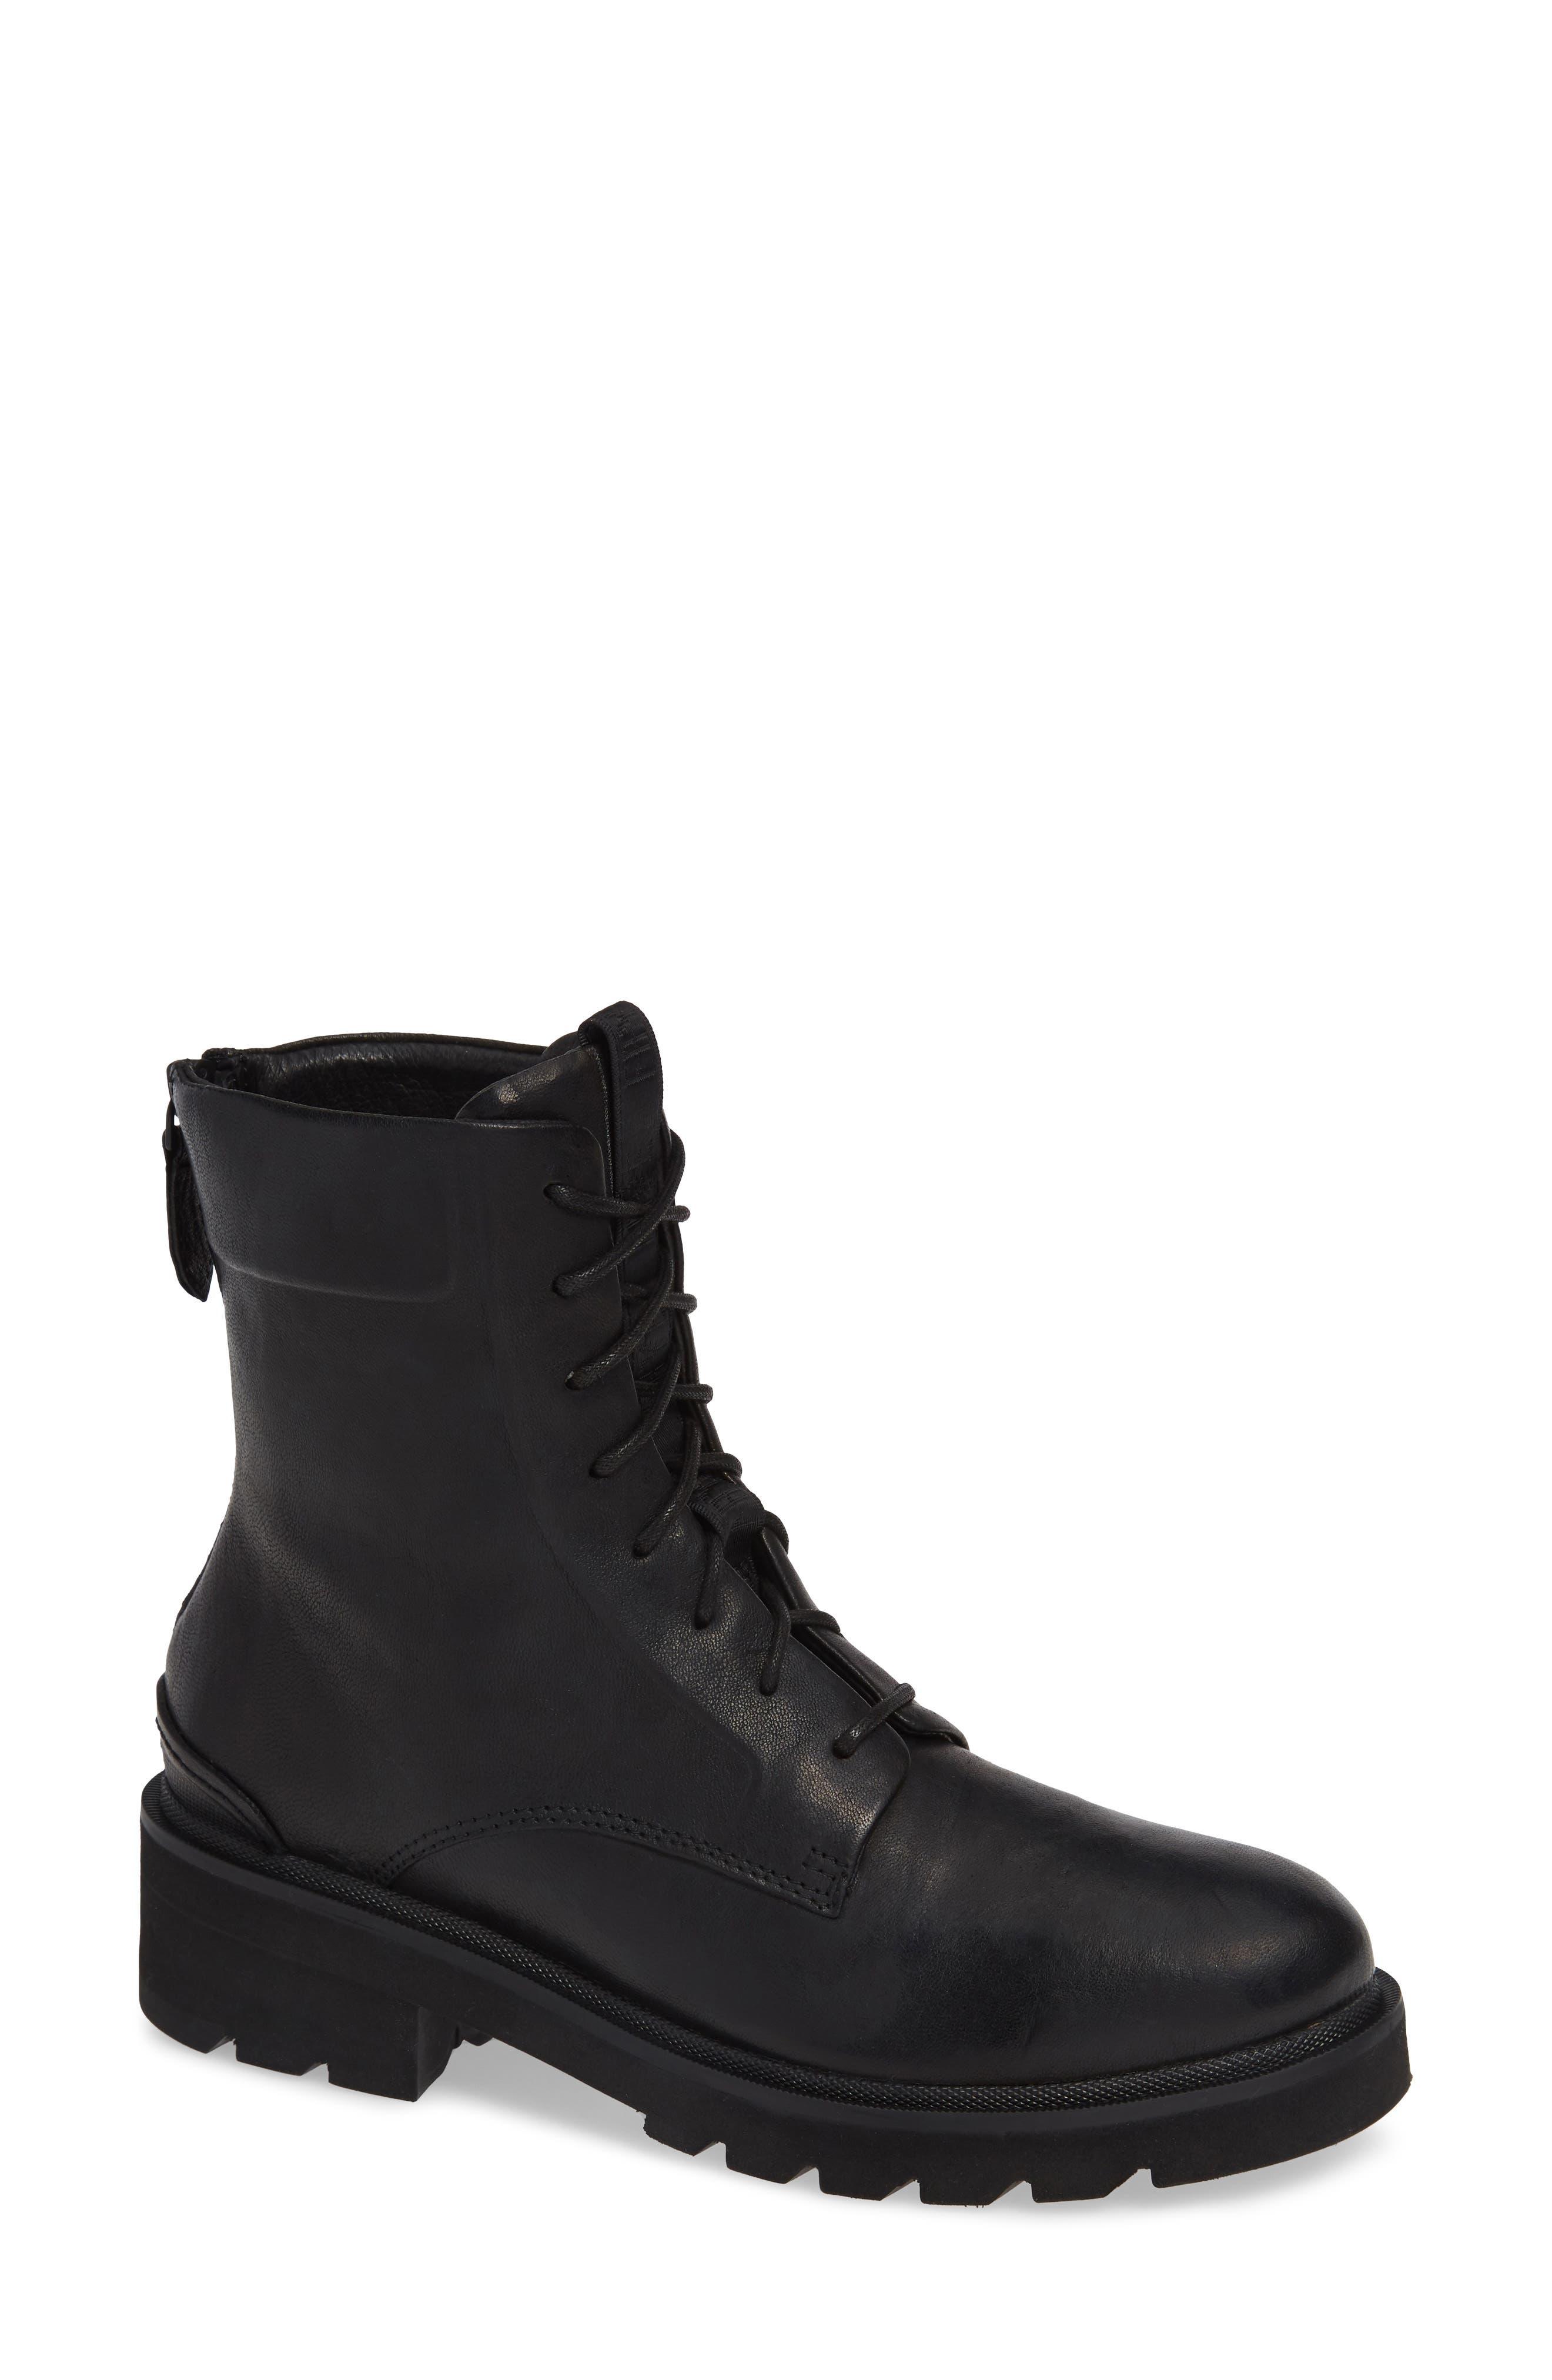 Frye Allison Combat Boot, Black